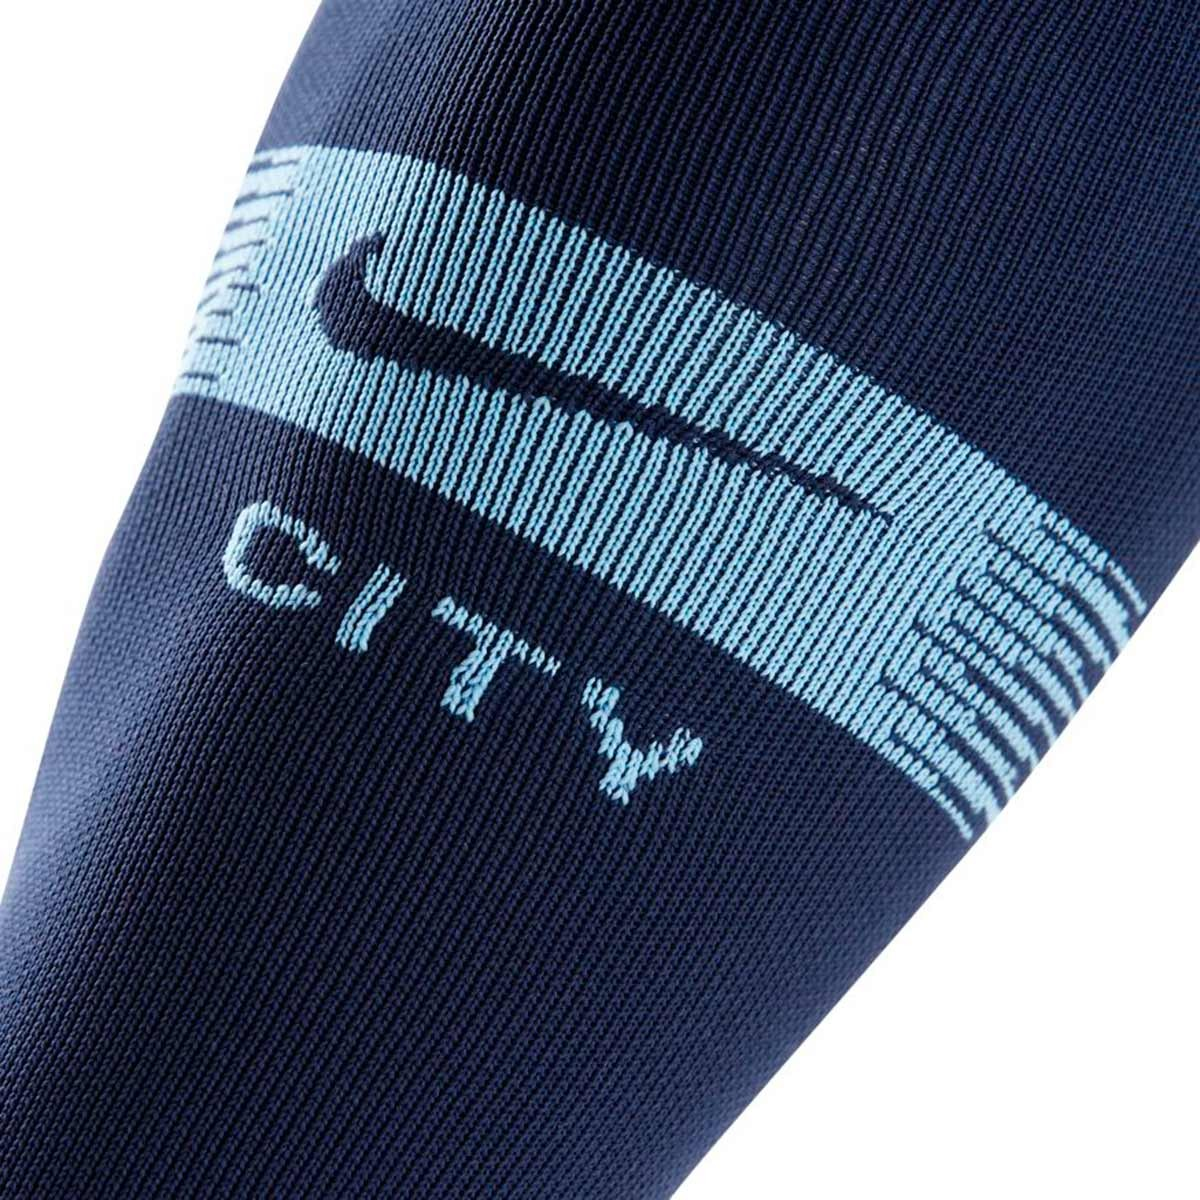 medias del manchester city